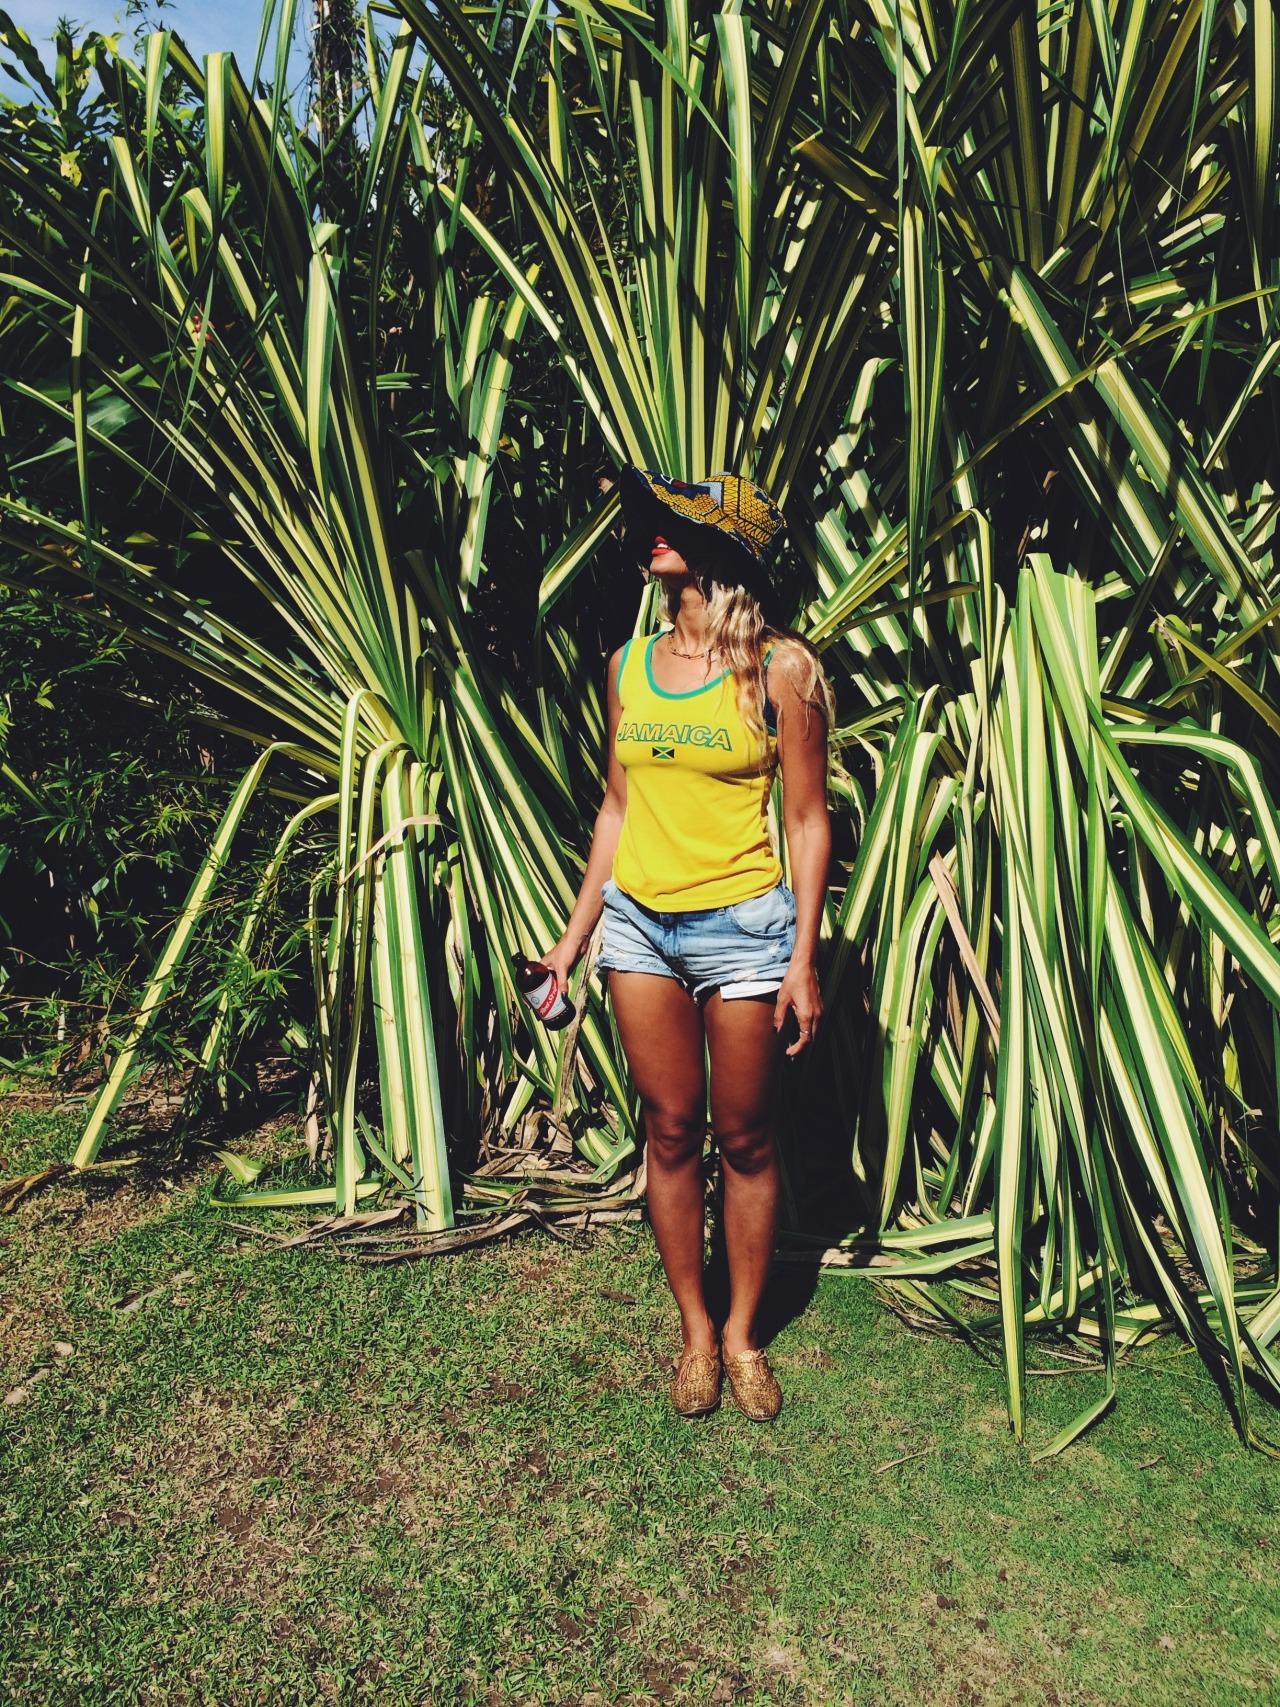 Beyoncé - Twitter (@Beyonce), Instagram (Baddiebey), Tumblr (I Am...) - Página 49 Tumblr_mx9eeaOSP21rqgjz2o1_1280